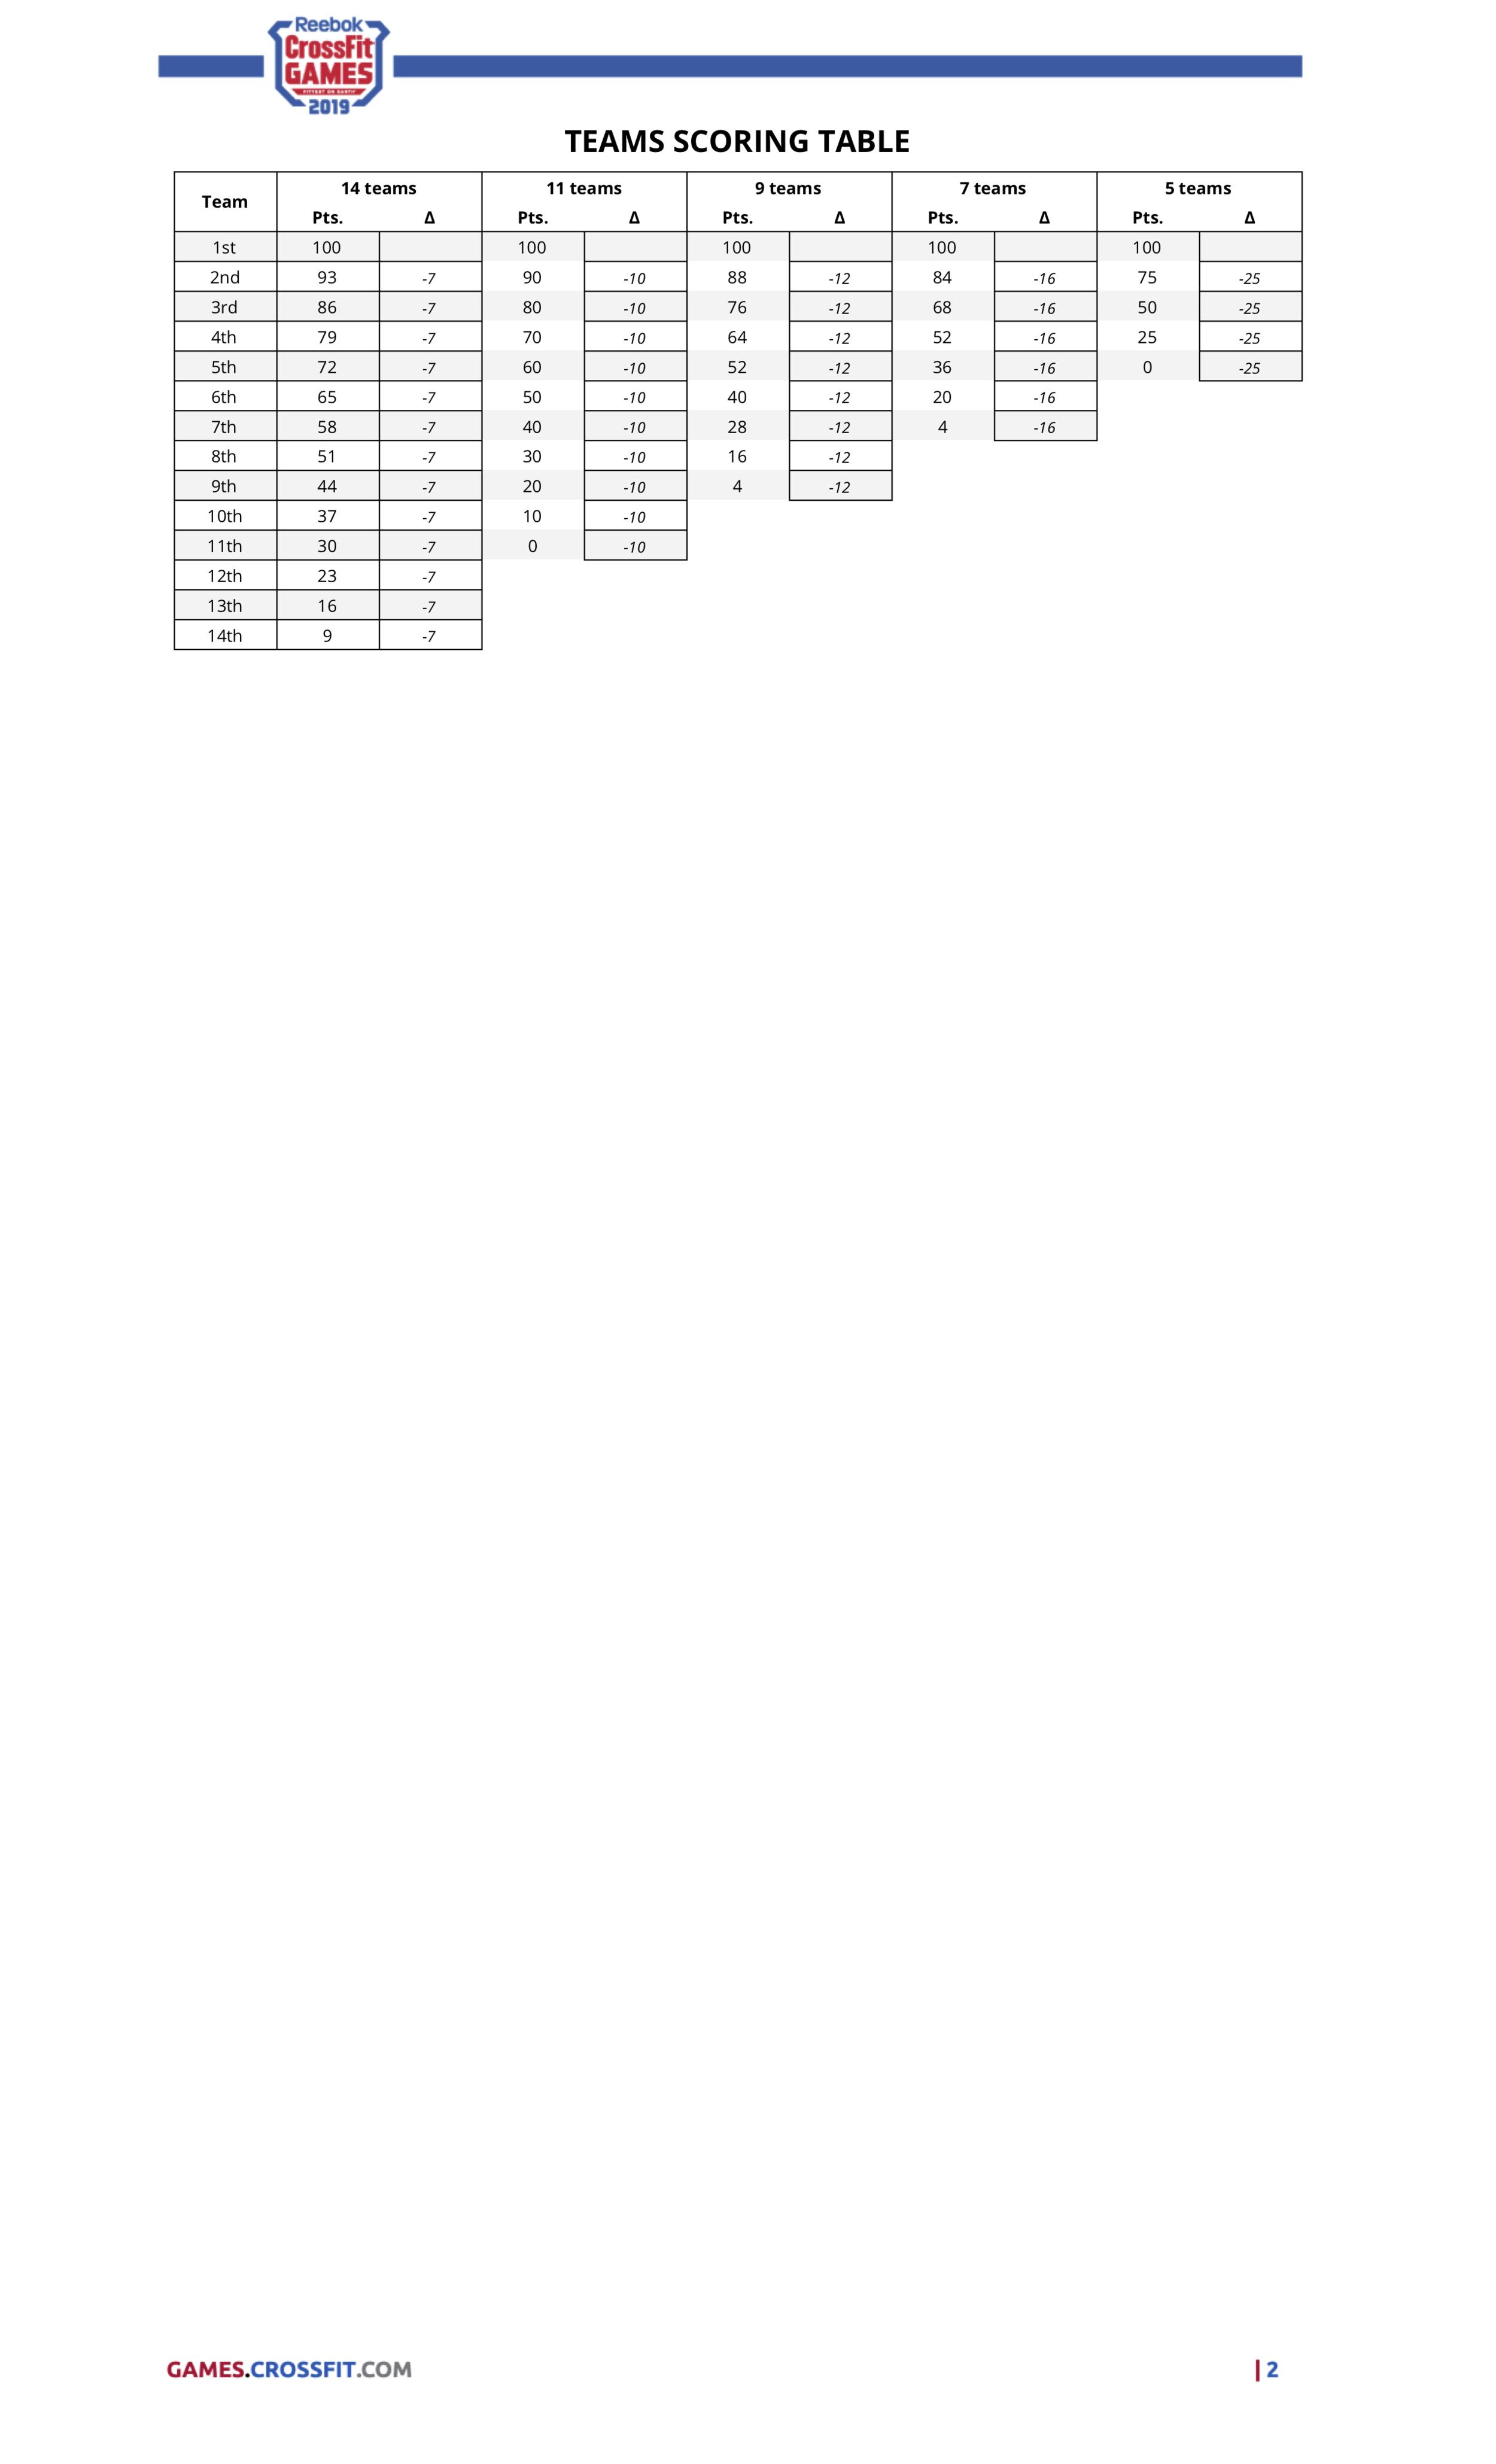 CFG19_Scoring_Table_Teams.png